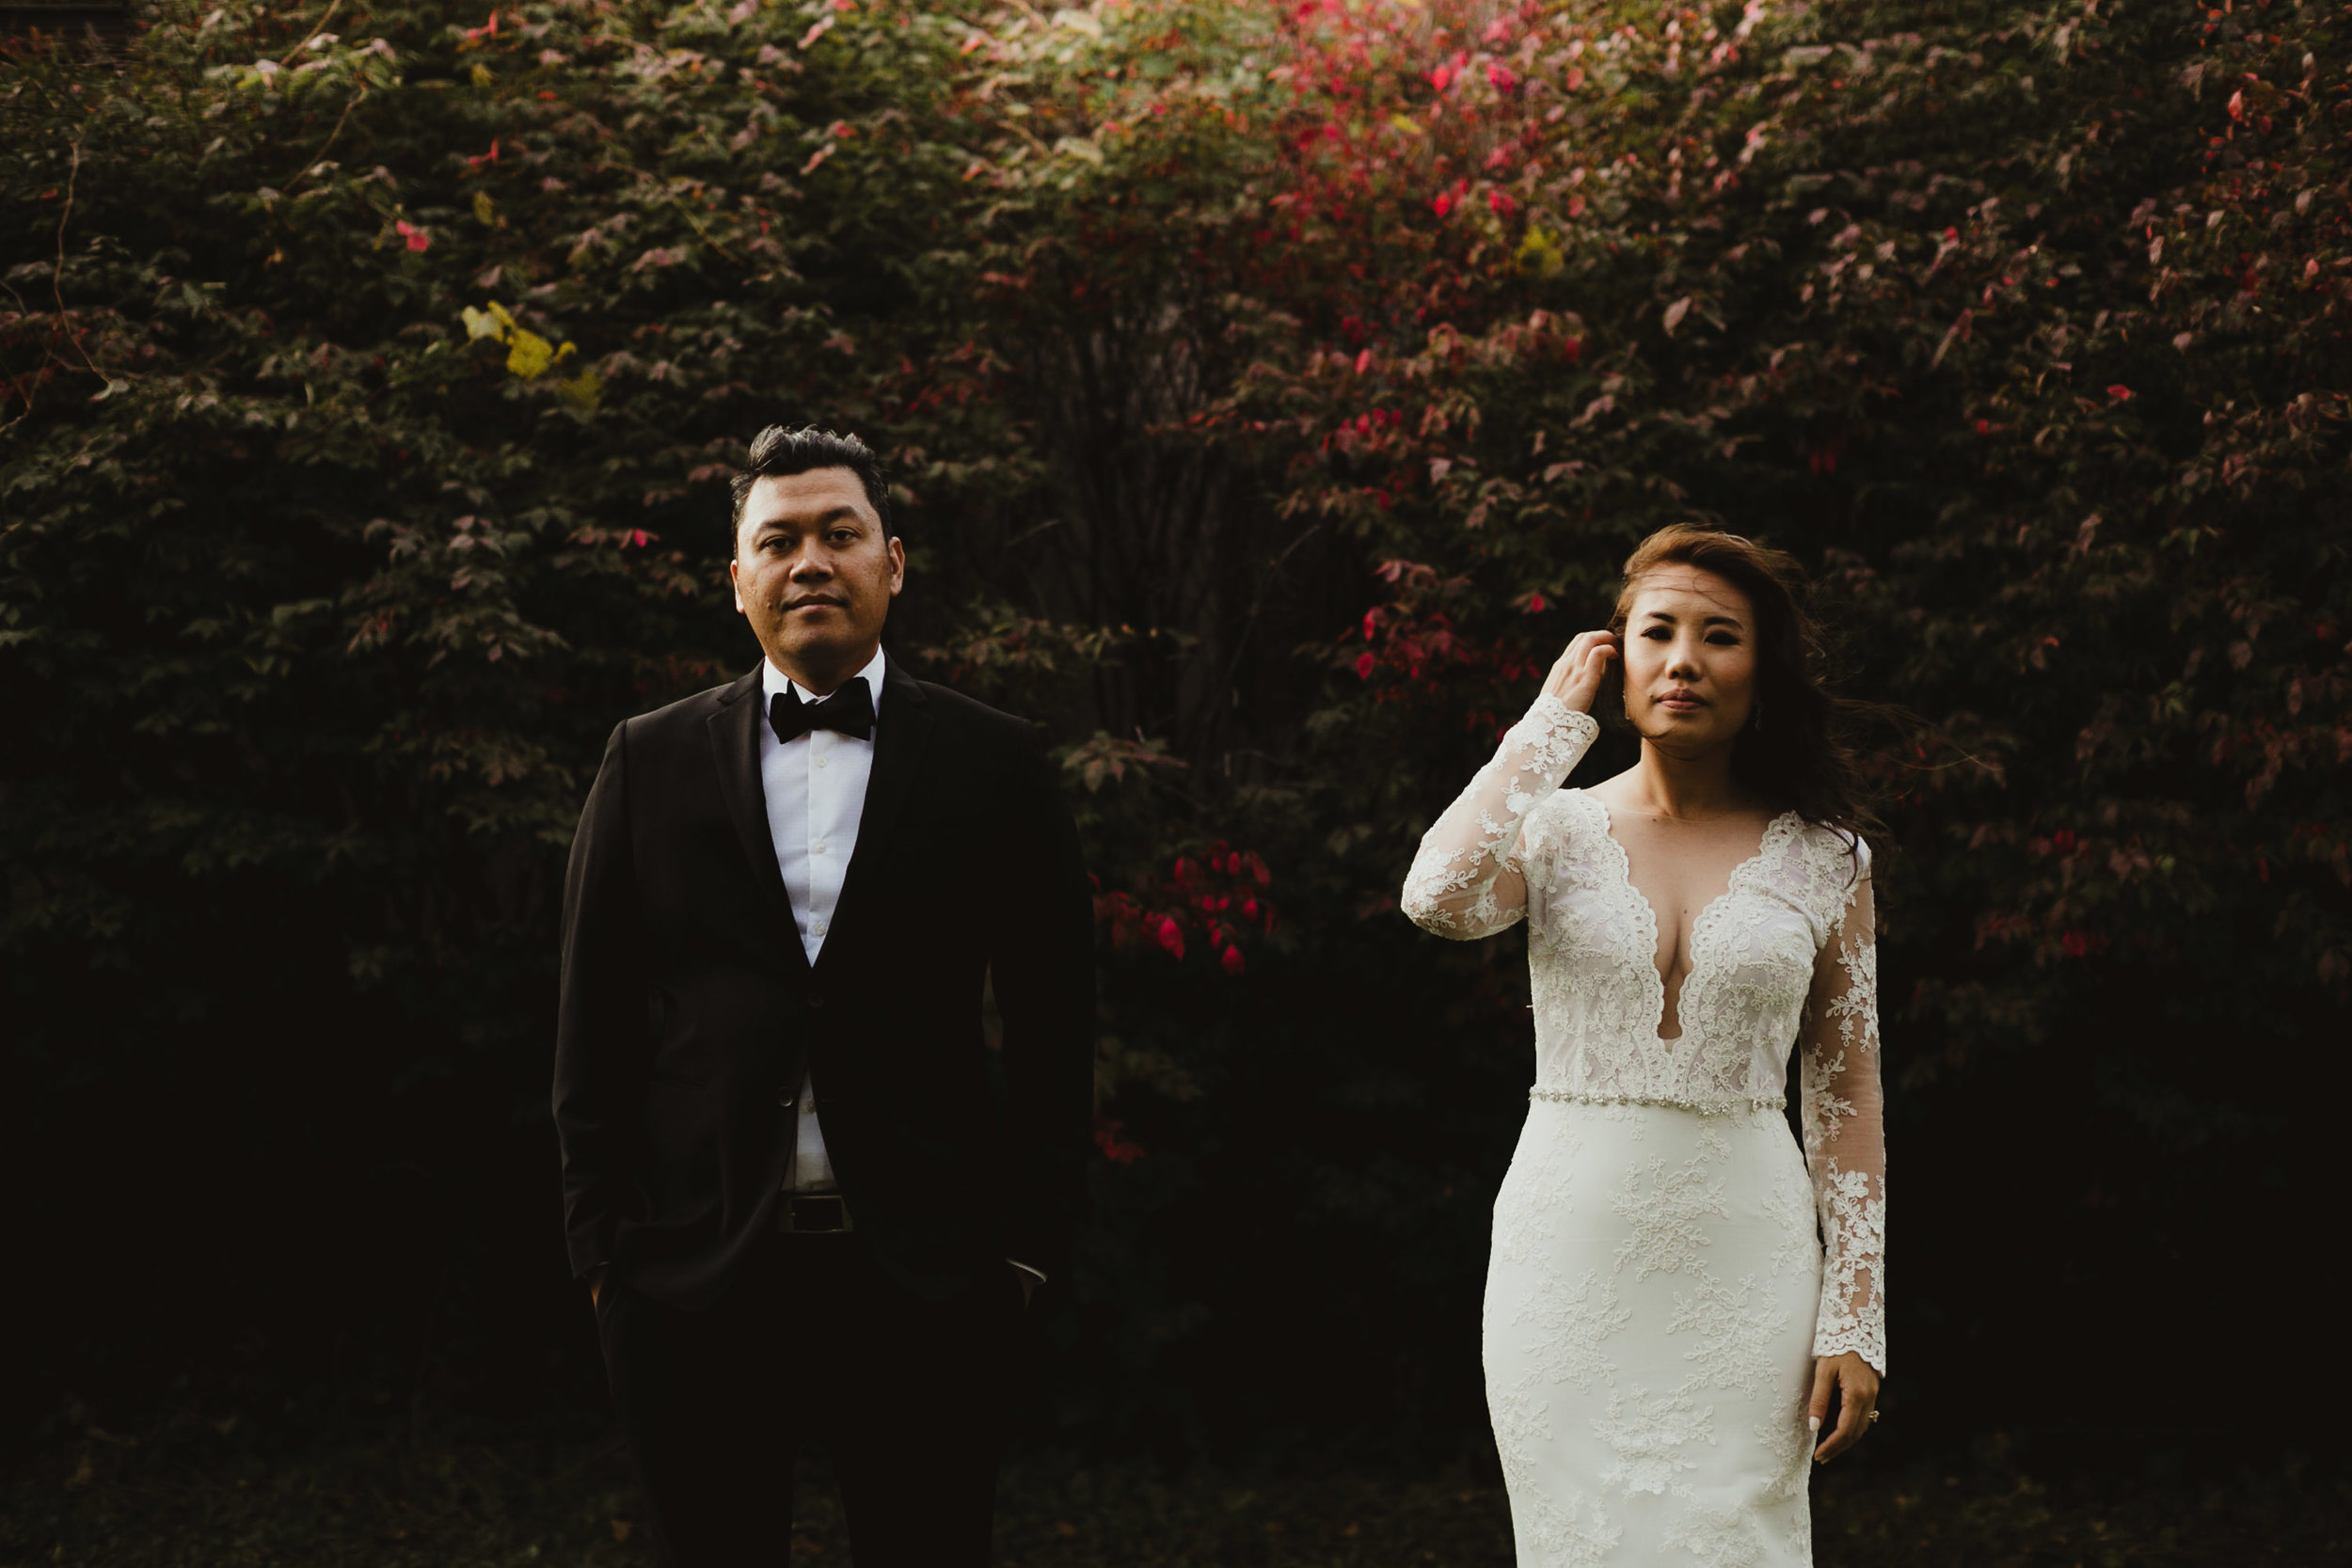 kansas-city-wedding-photographer_046.jpg